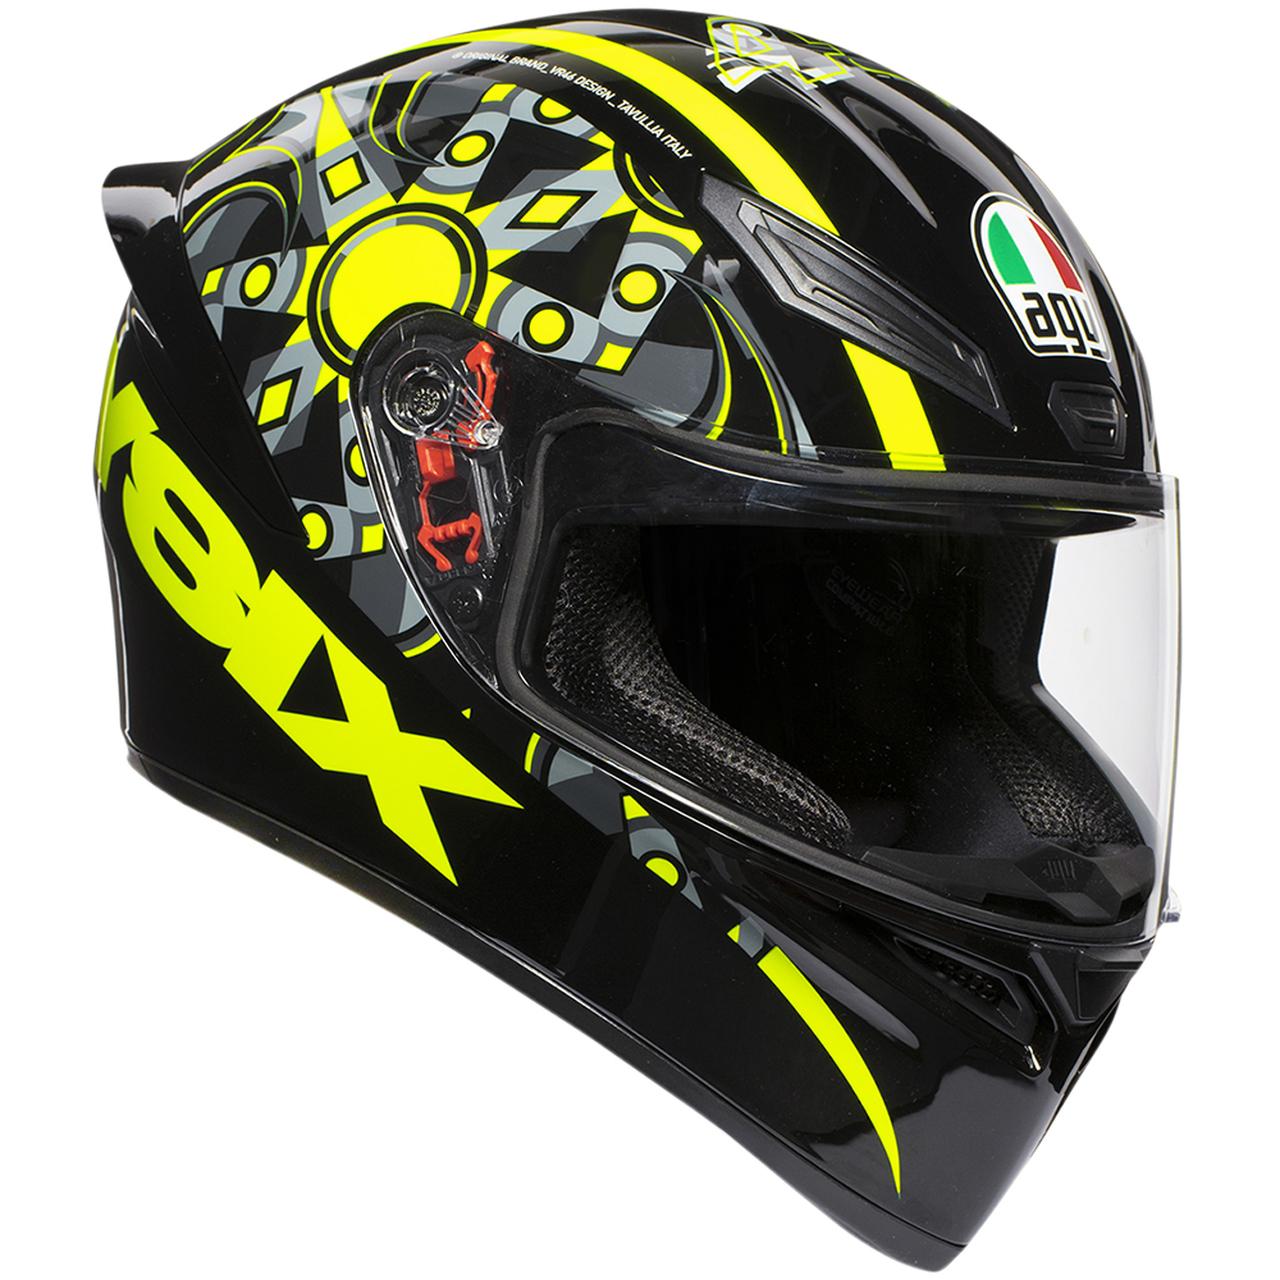 Image result for agv helmets